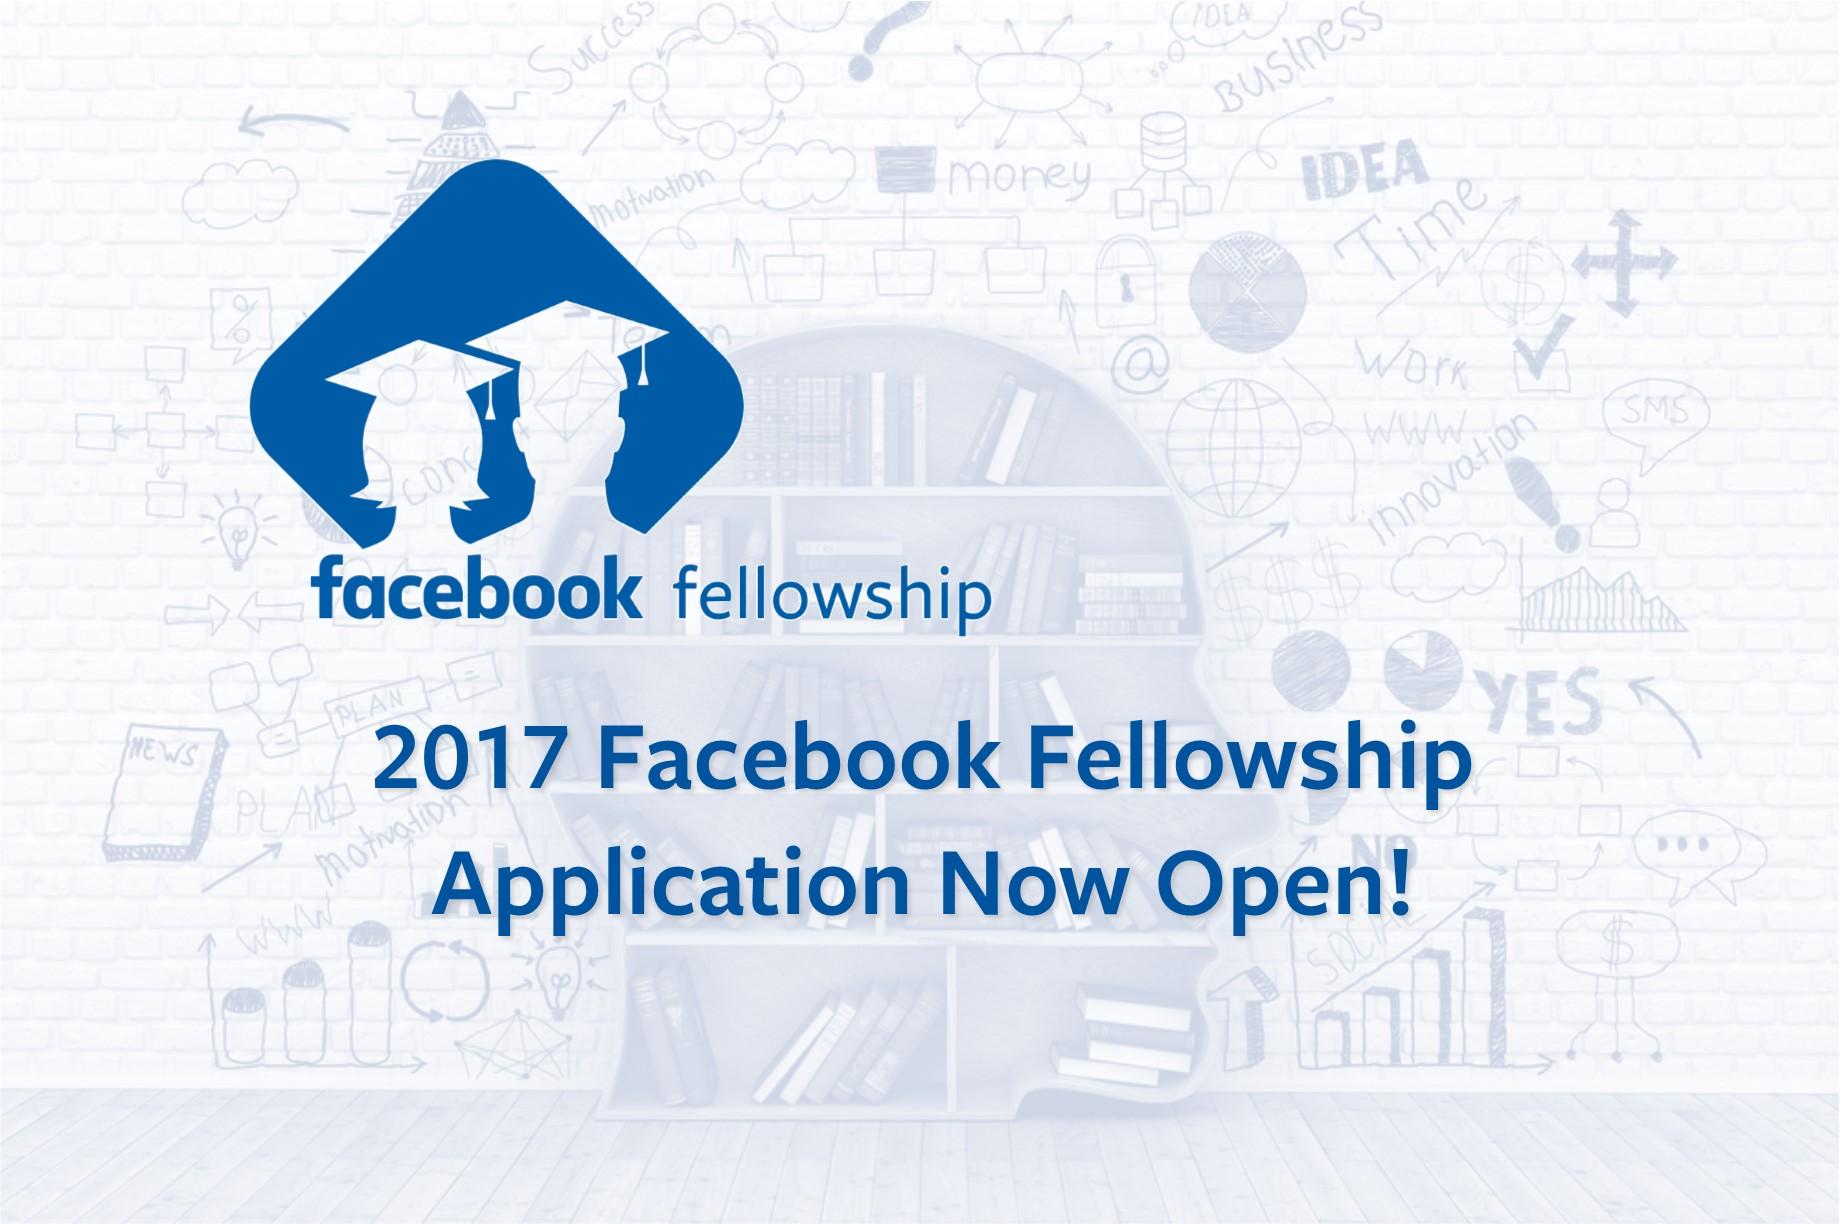 Fully Funded Facebook Fellowship Program 2017